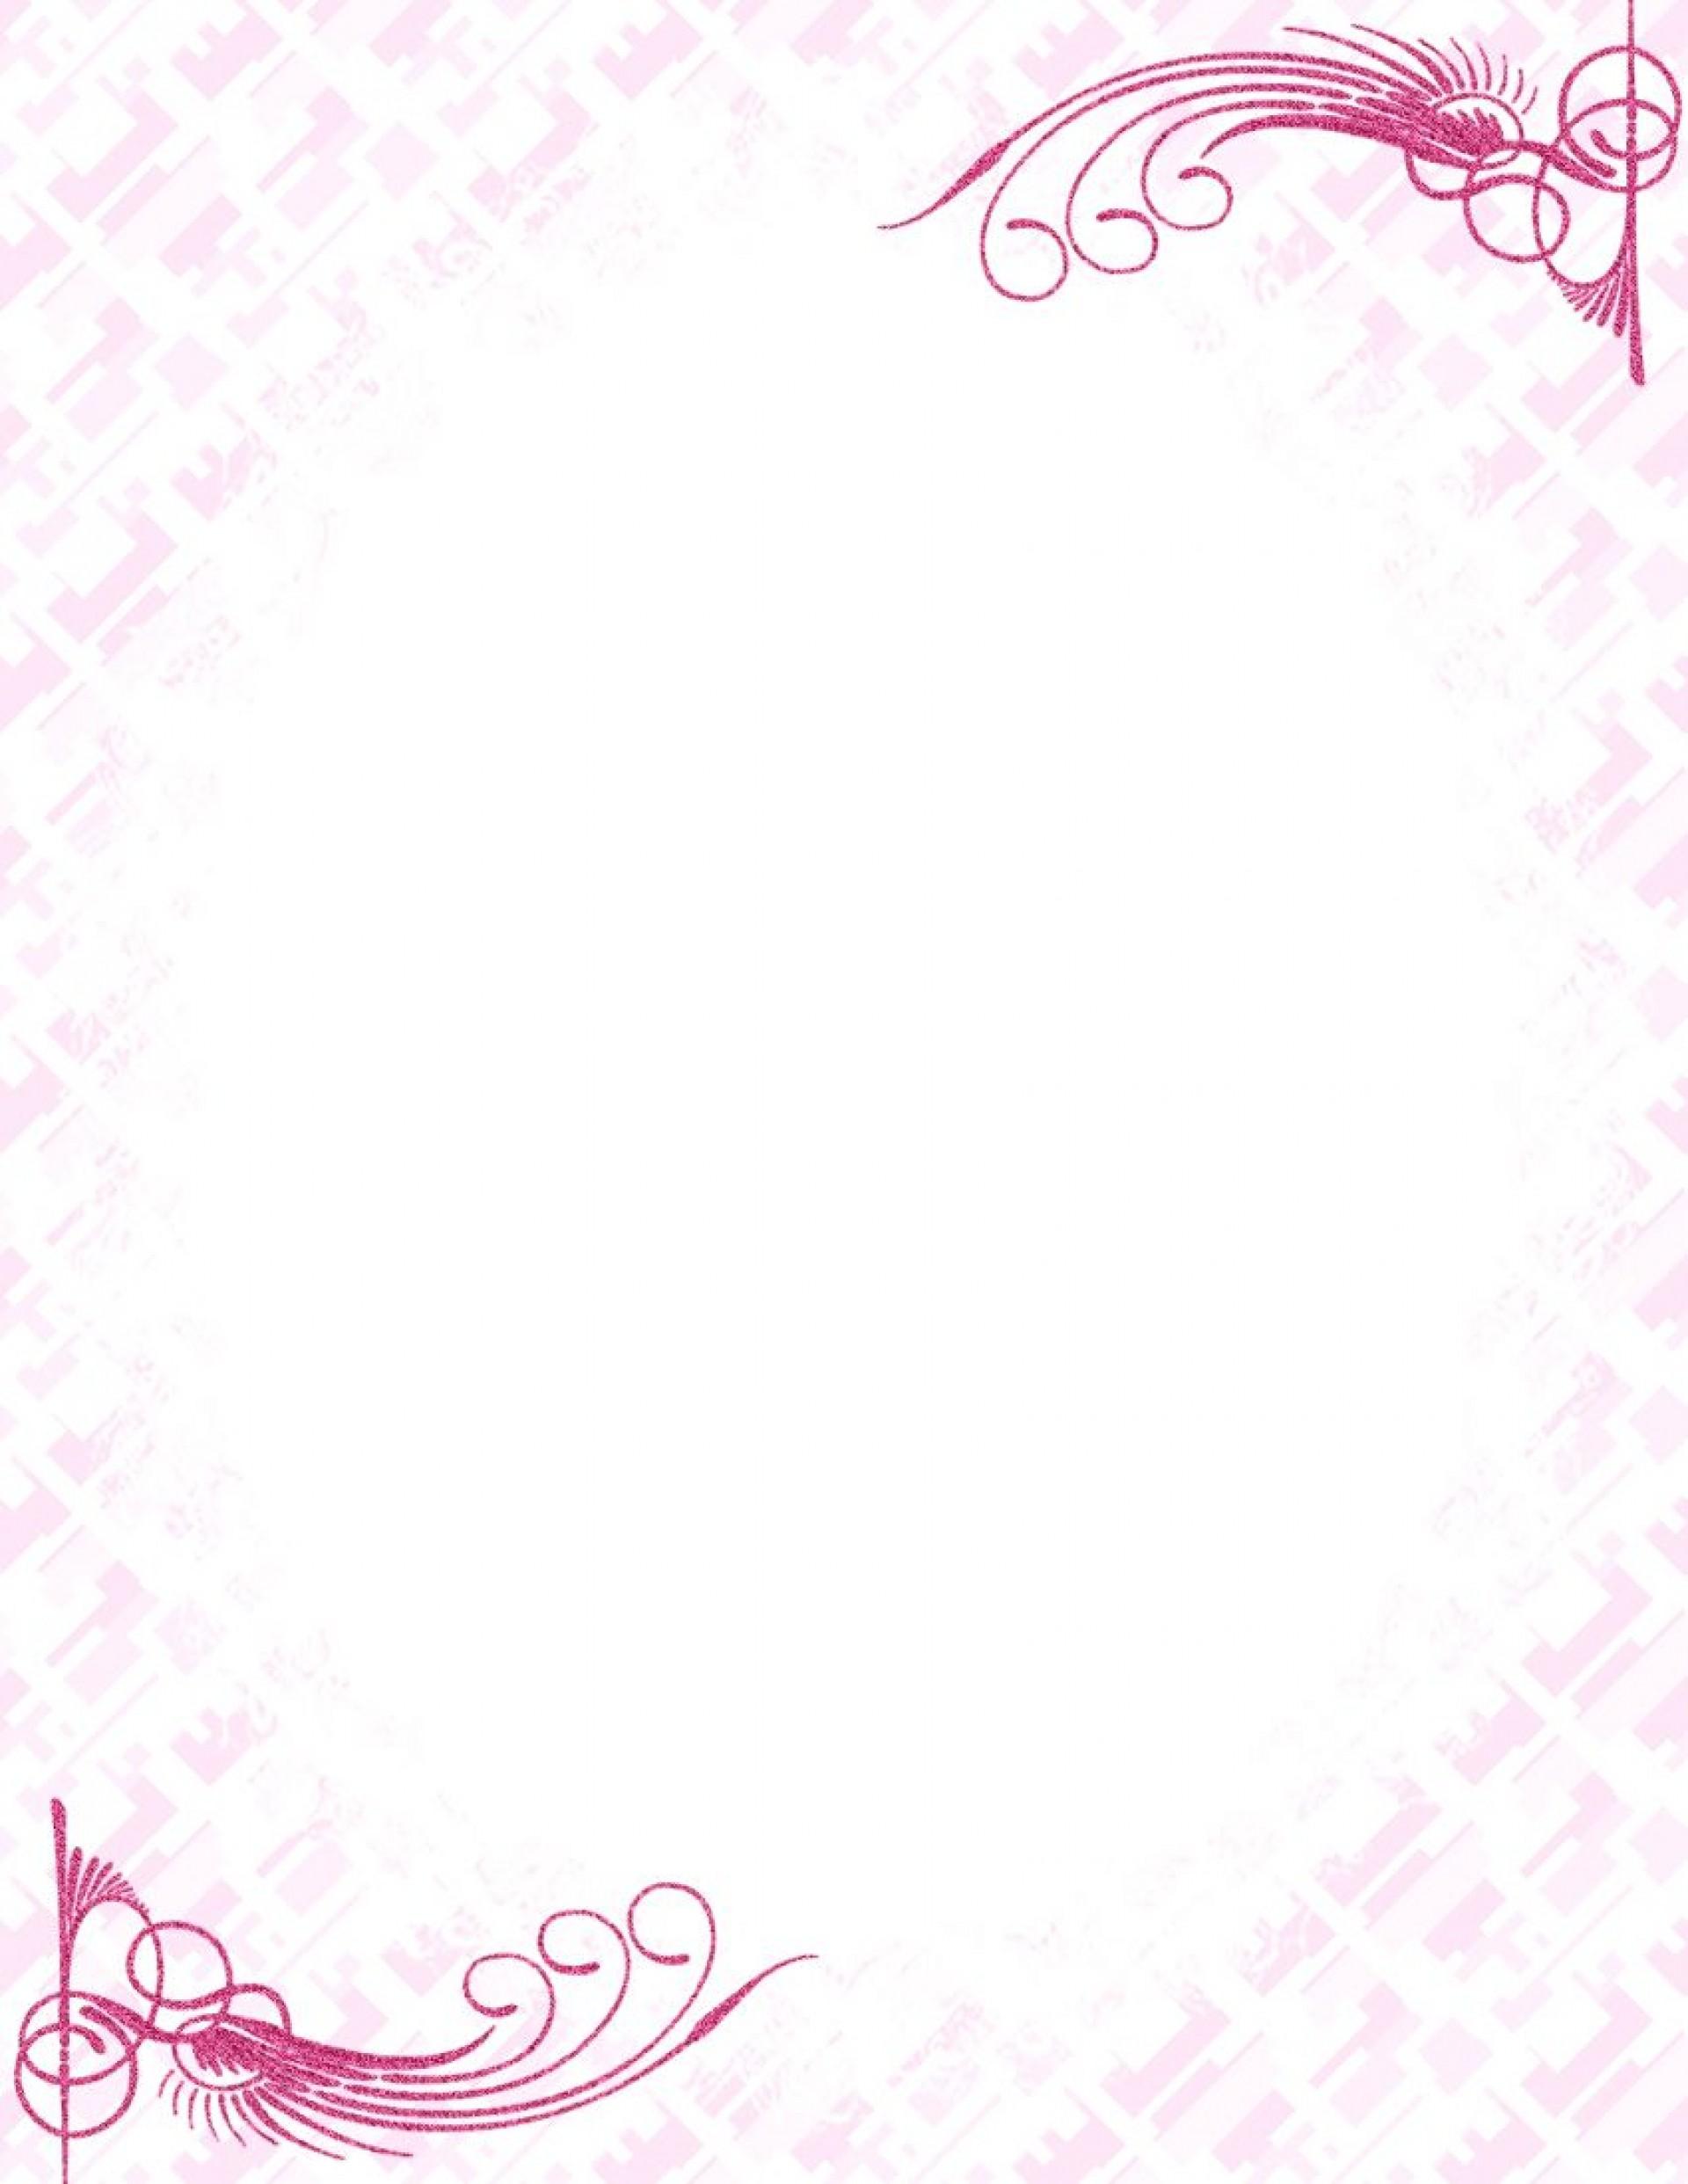 009 Unbelievable Free Printable Elegant Stationery Template Idea  Templates1920